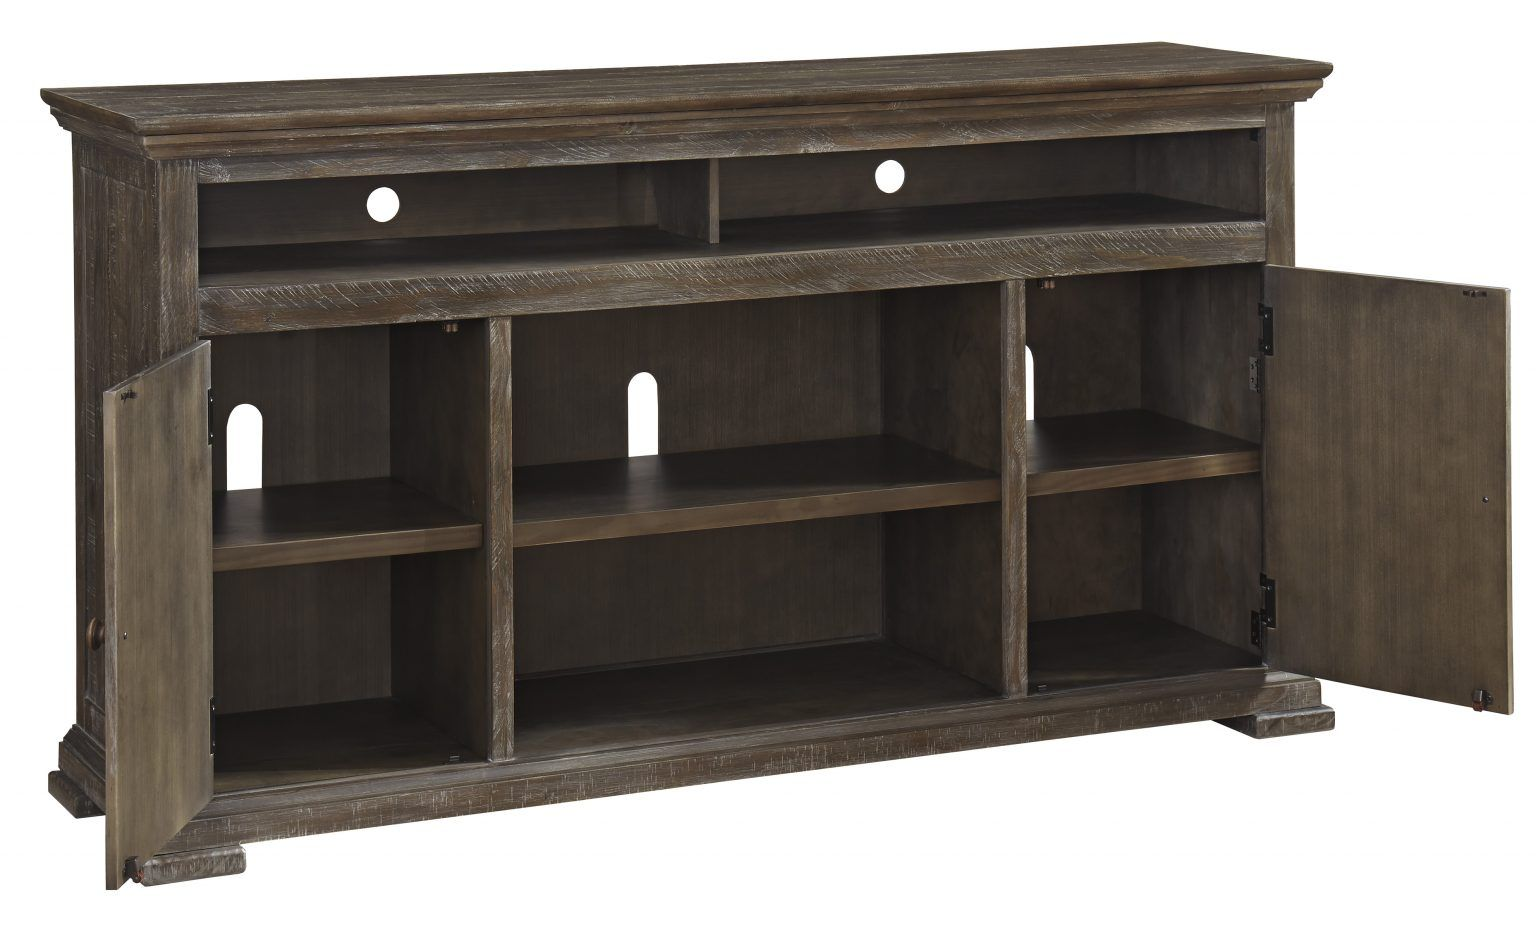 Rosedale Les Meubles Zip International In 2020 Home Decor Furniture Storage